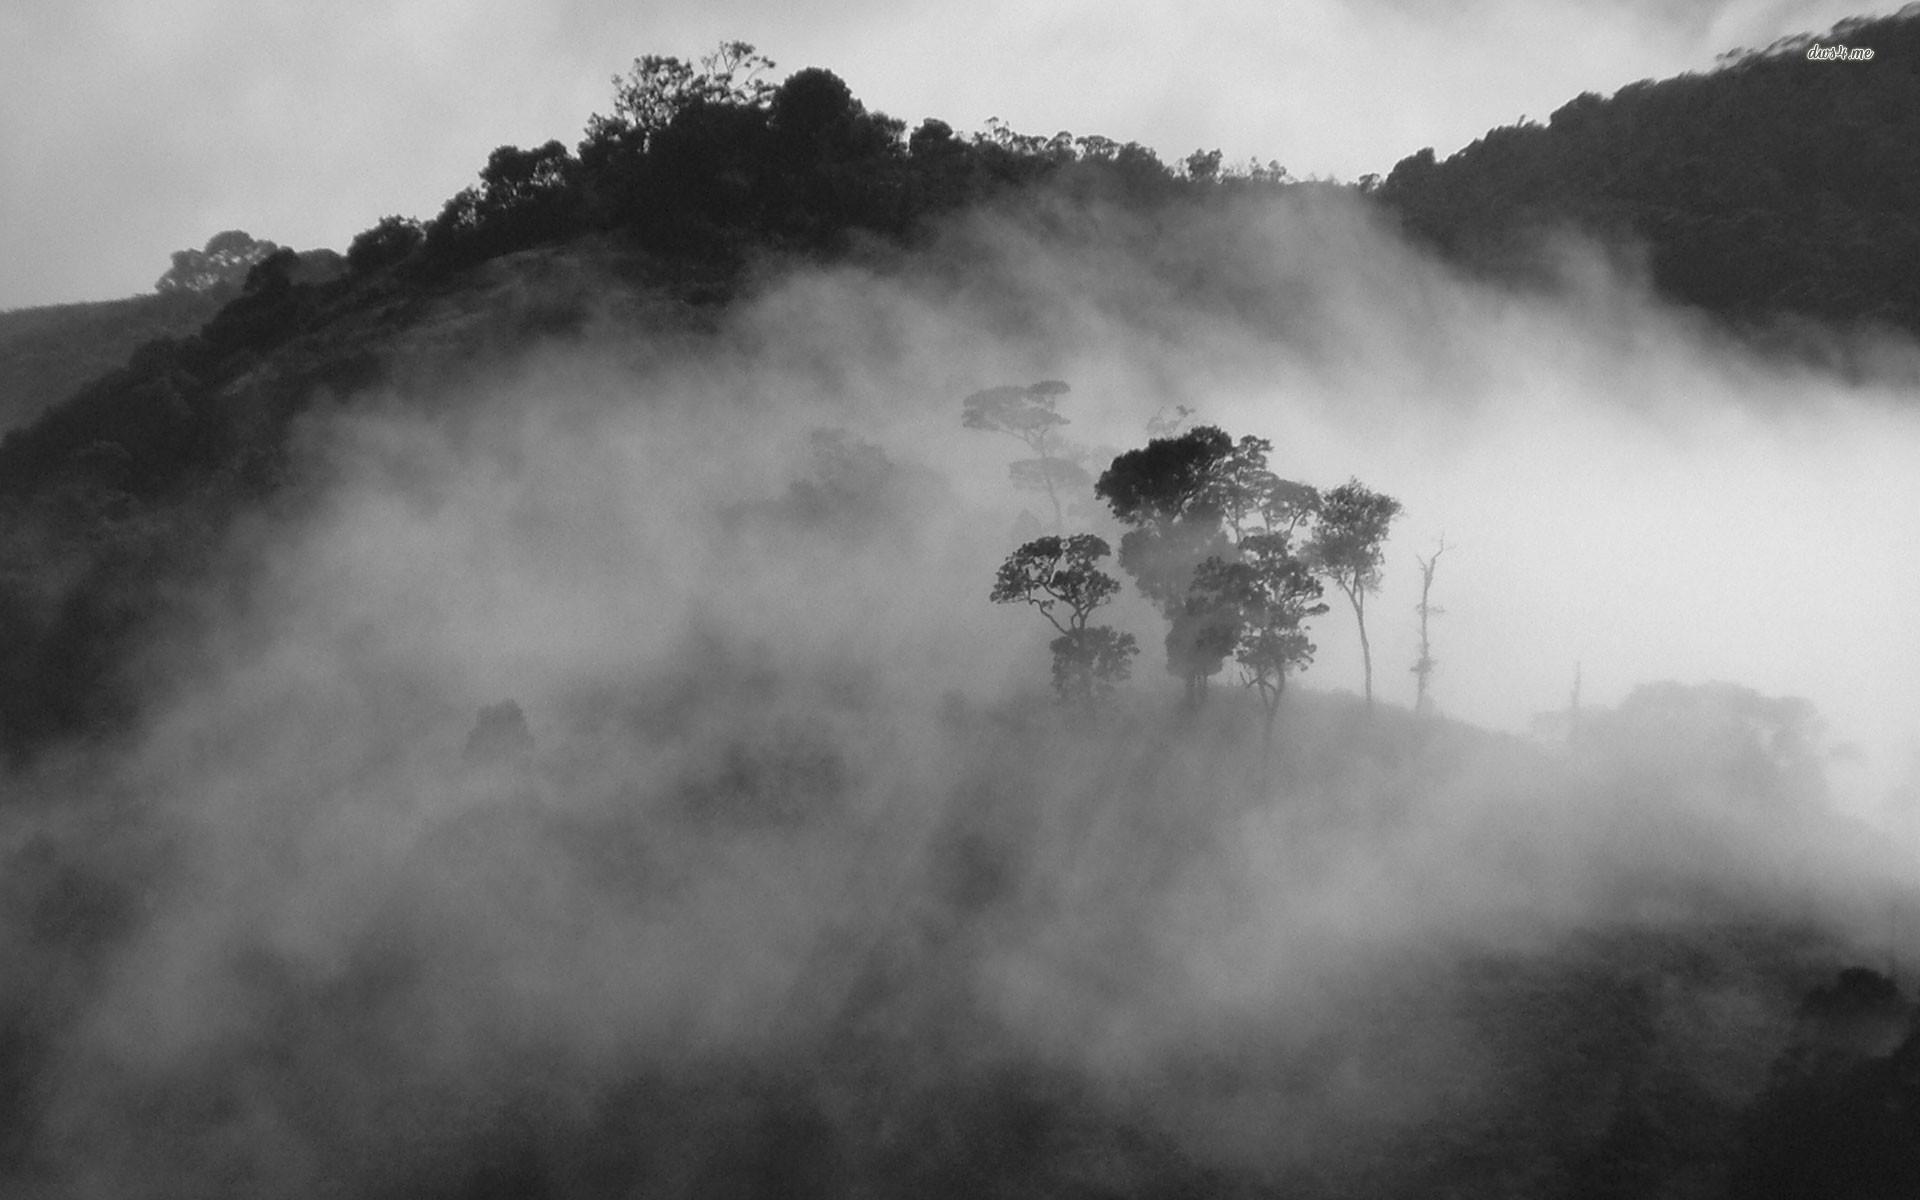 ... Fog wallpaper 1920x1200 ...